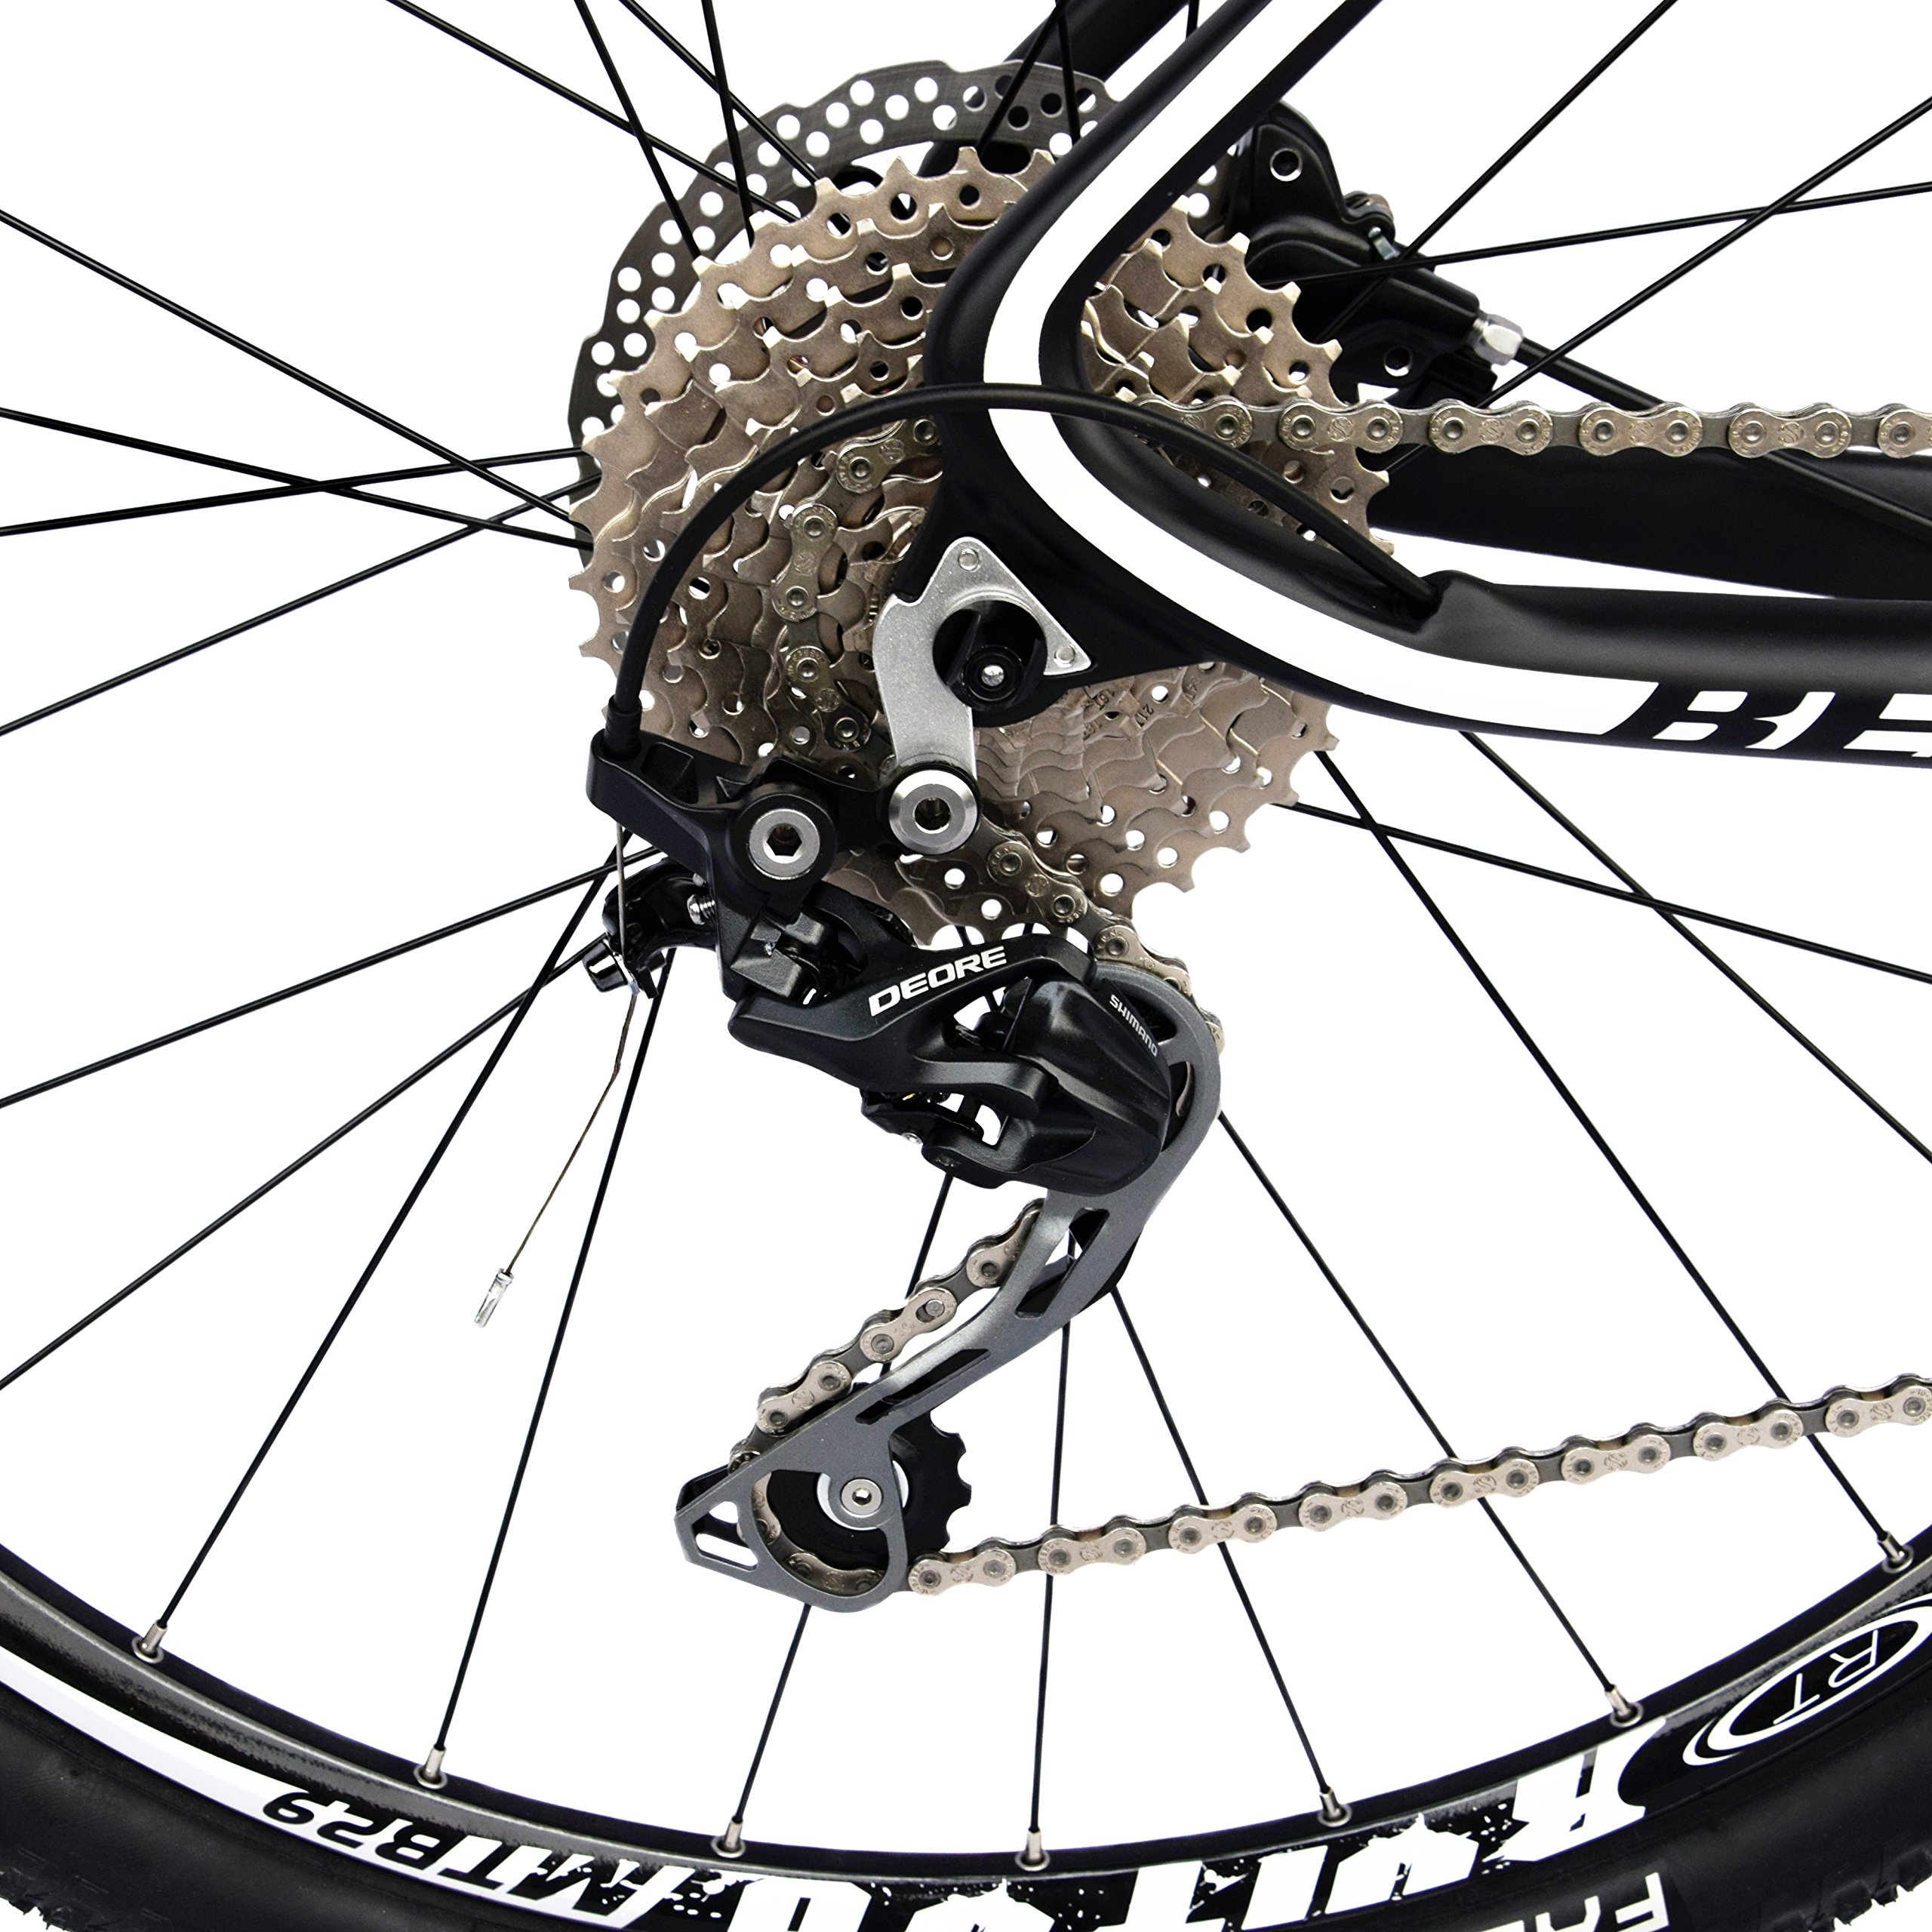 Beiou Carbon Fiber Mountain Bike Review 5